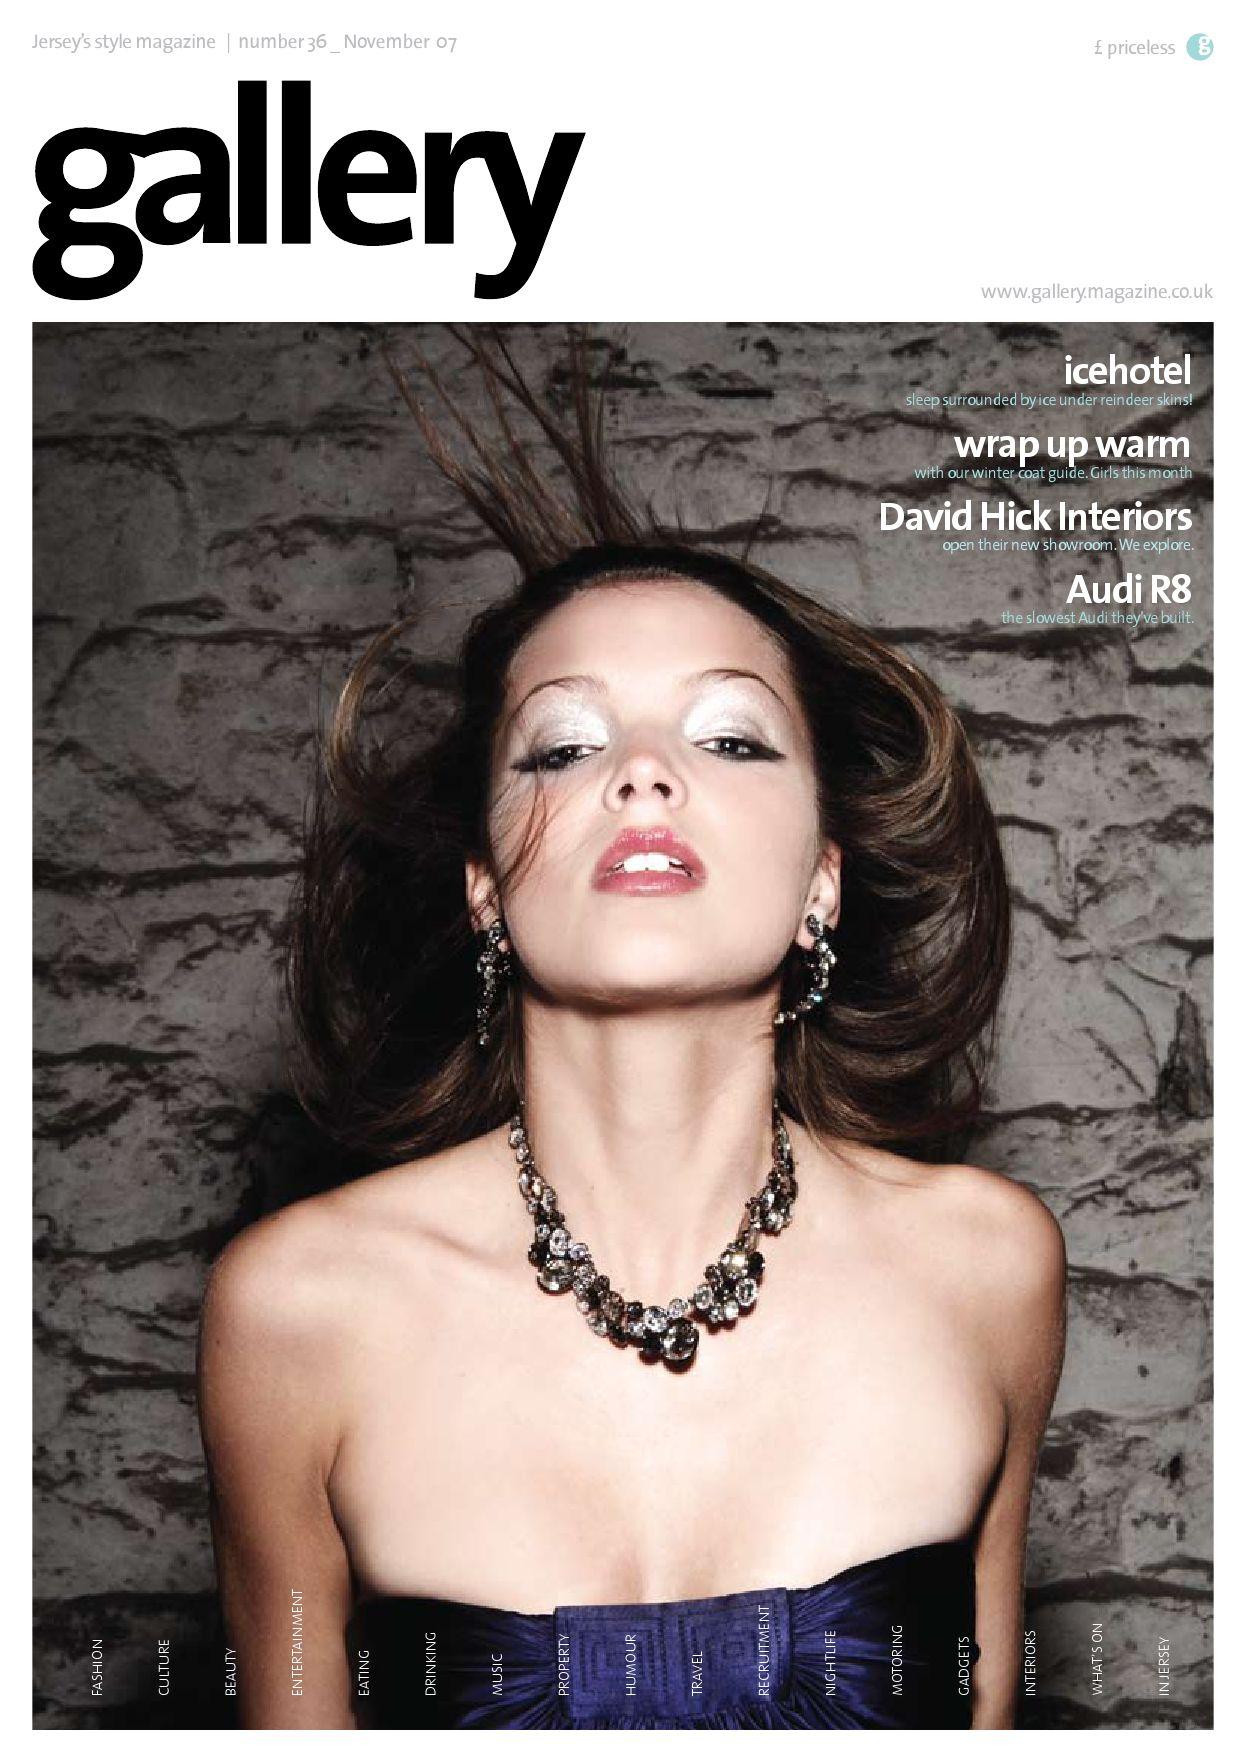 f6bea081d12 Jersey s Style Magazine